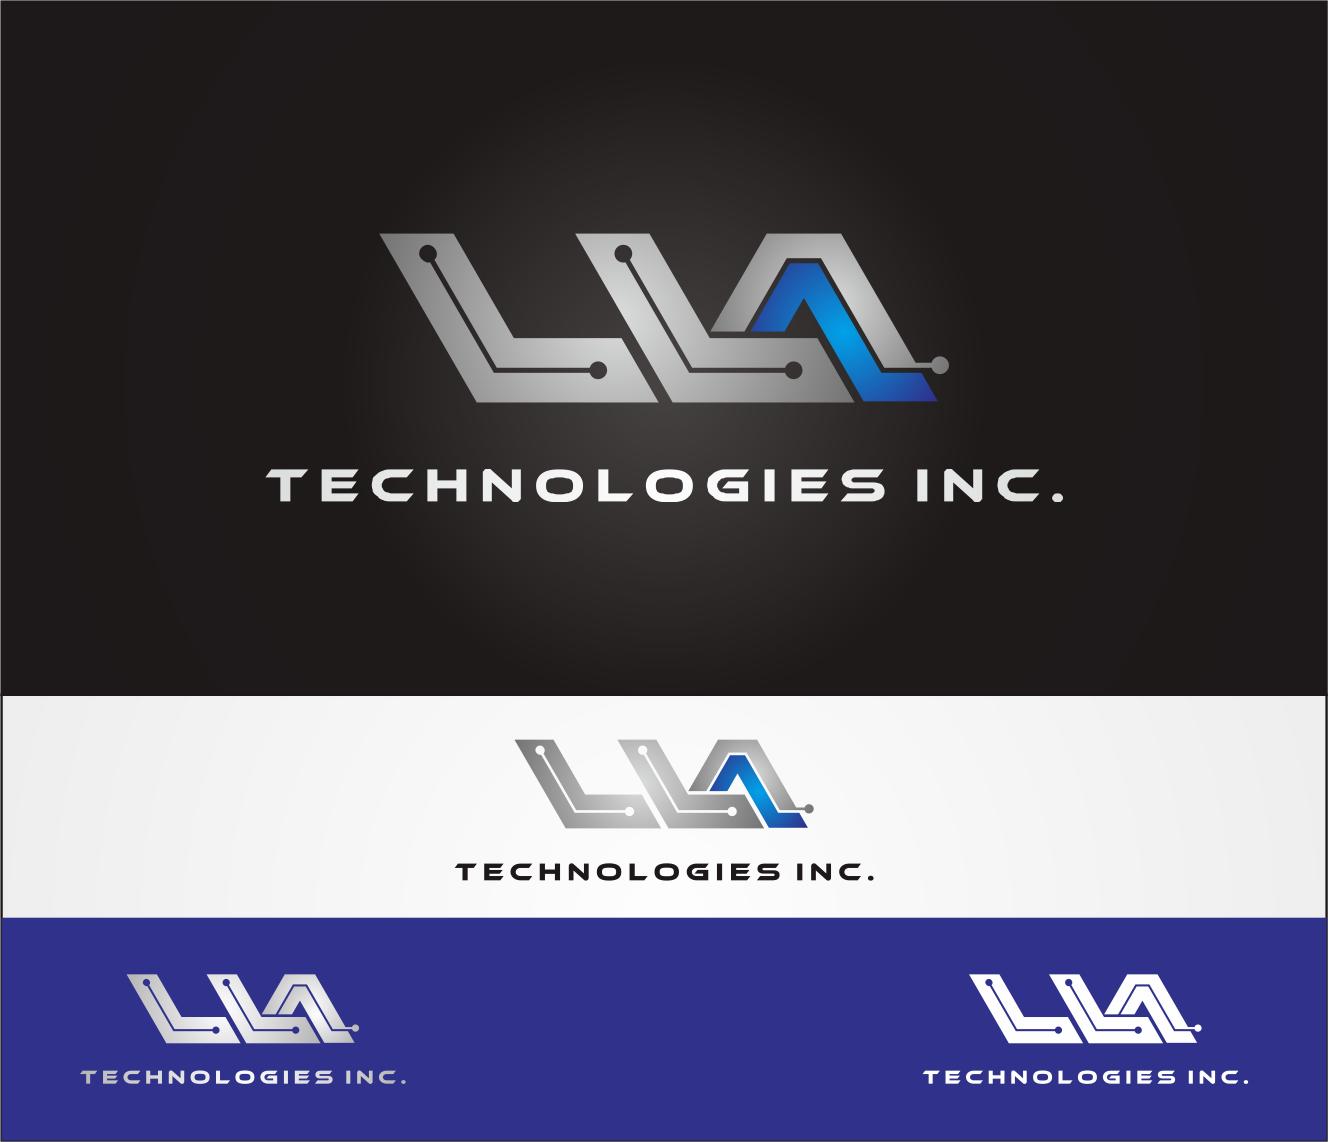 Logo Design by Armada Jamaluddin - Entry No. 139 in the Logo Design Contest Inspiring Logo Design for LLA Technologies Inc..